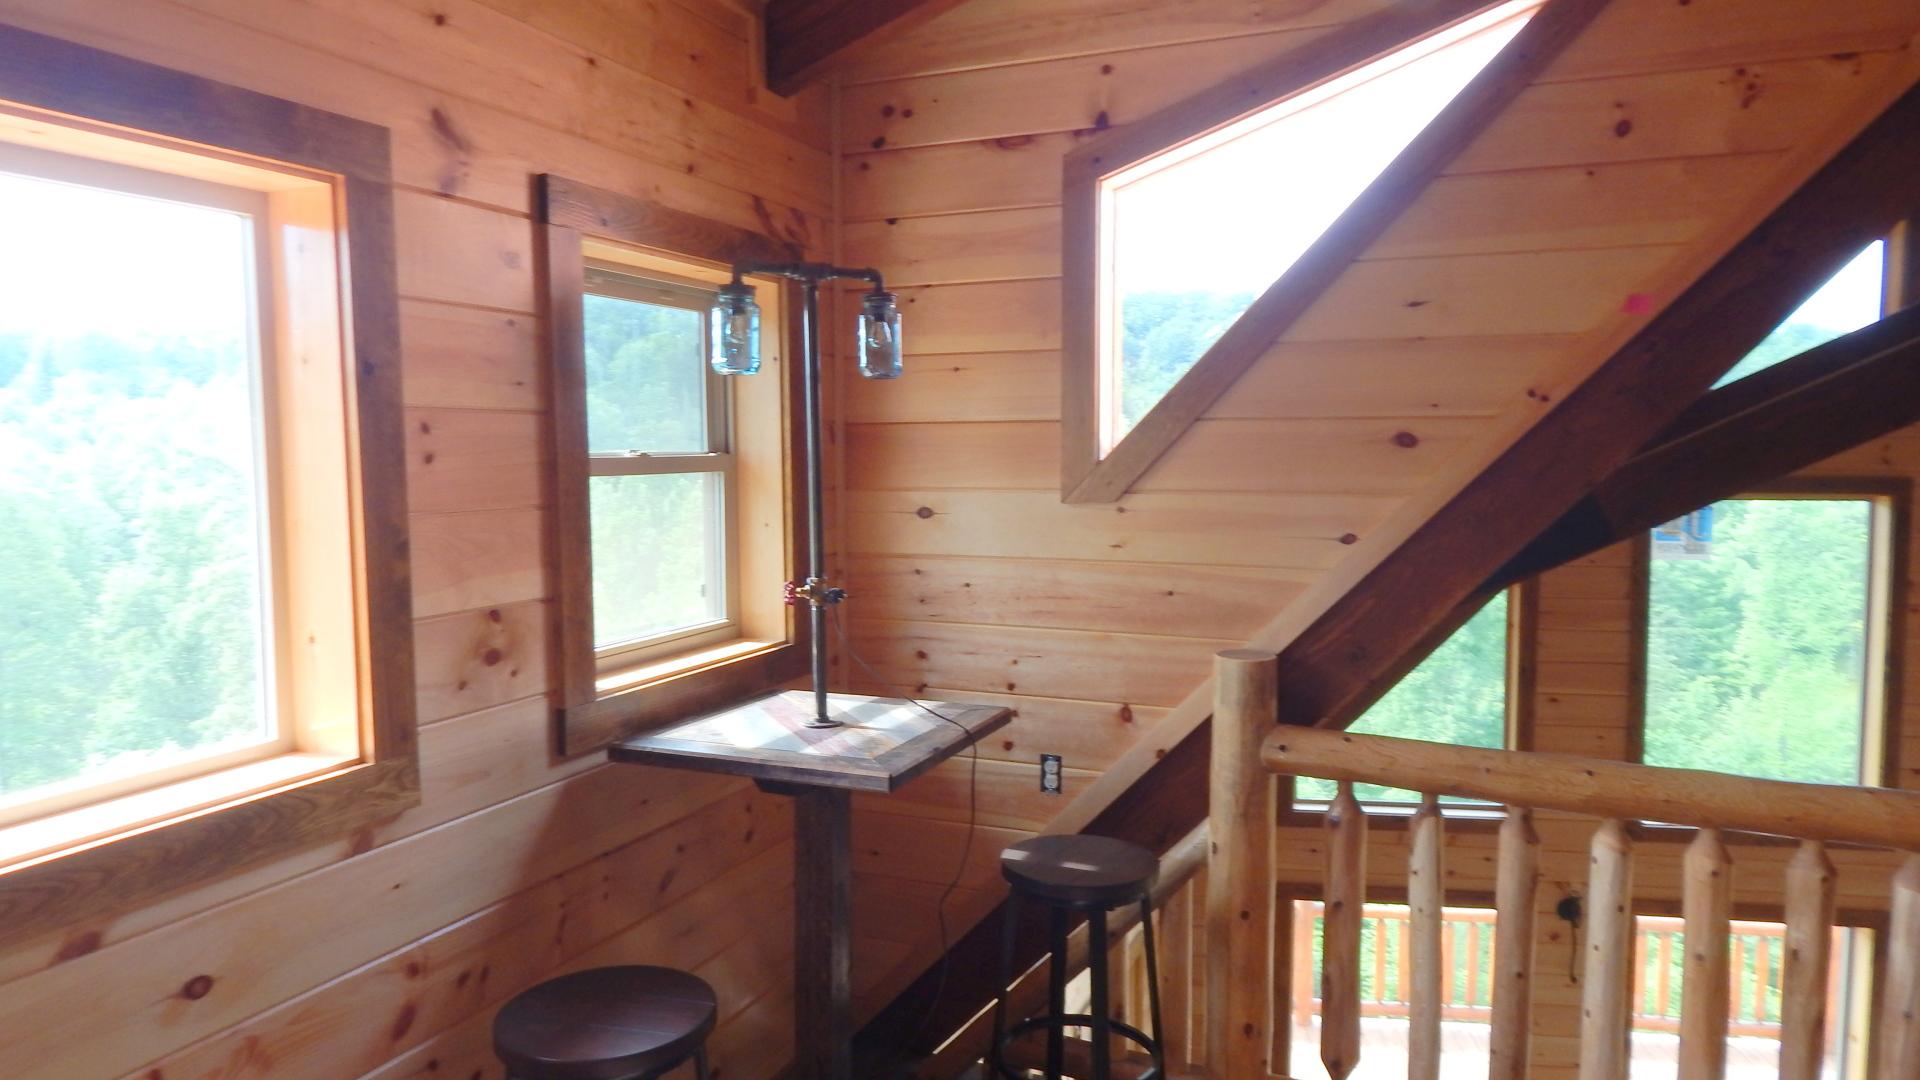 Ridge view lodge cabin game Loft